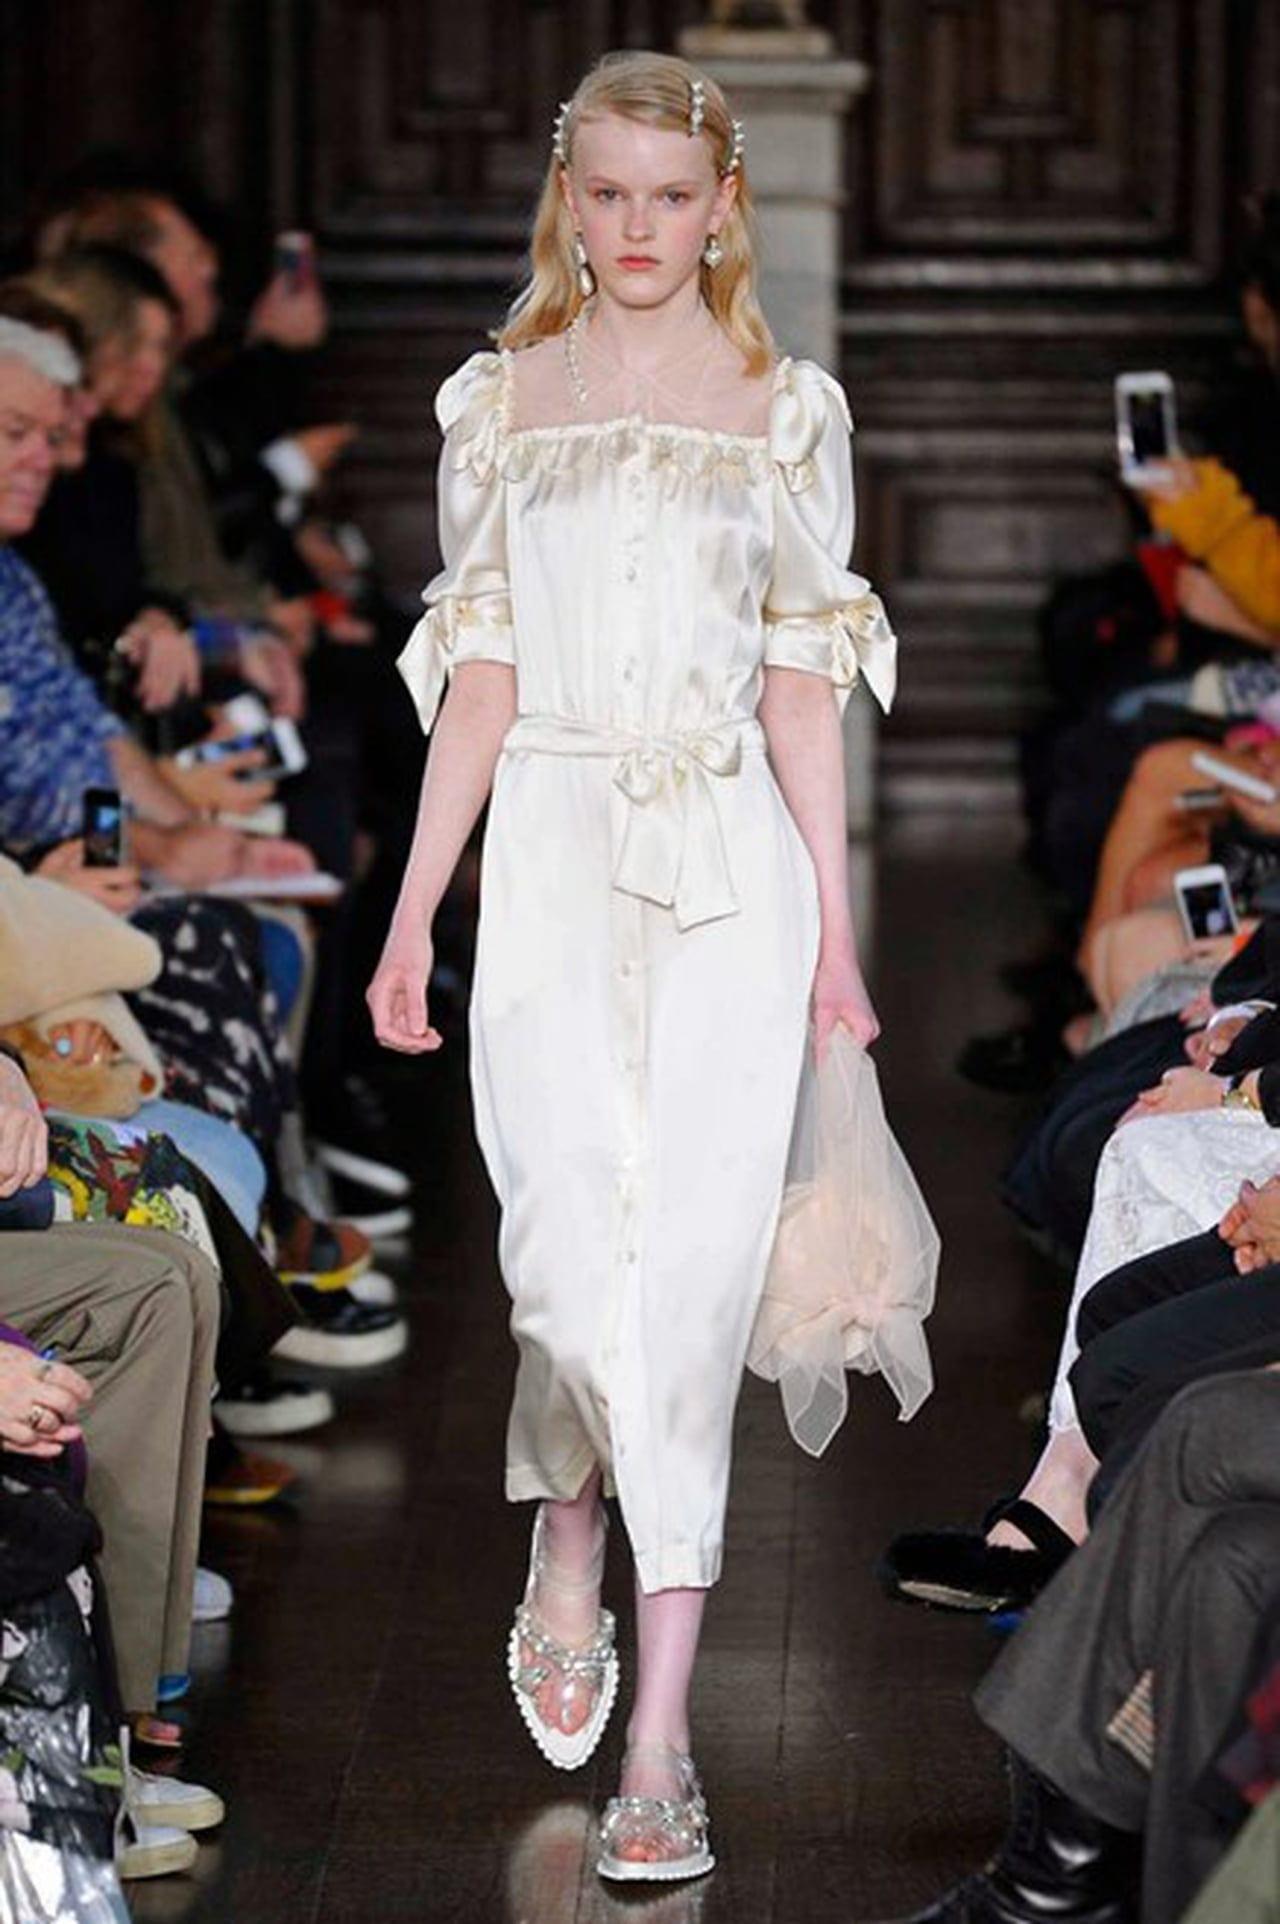 Pearl hair clips in Fall 2018 Fashion Show